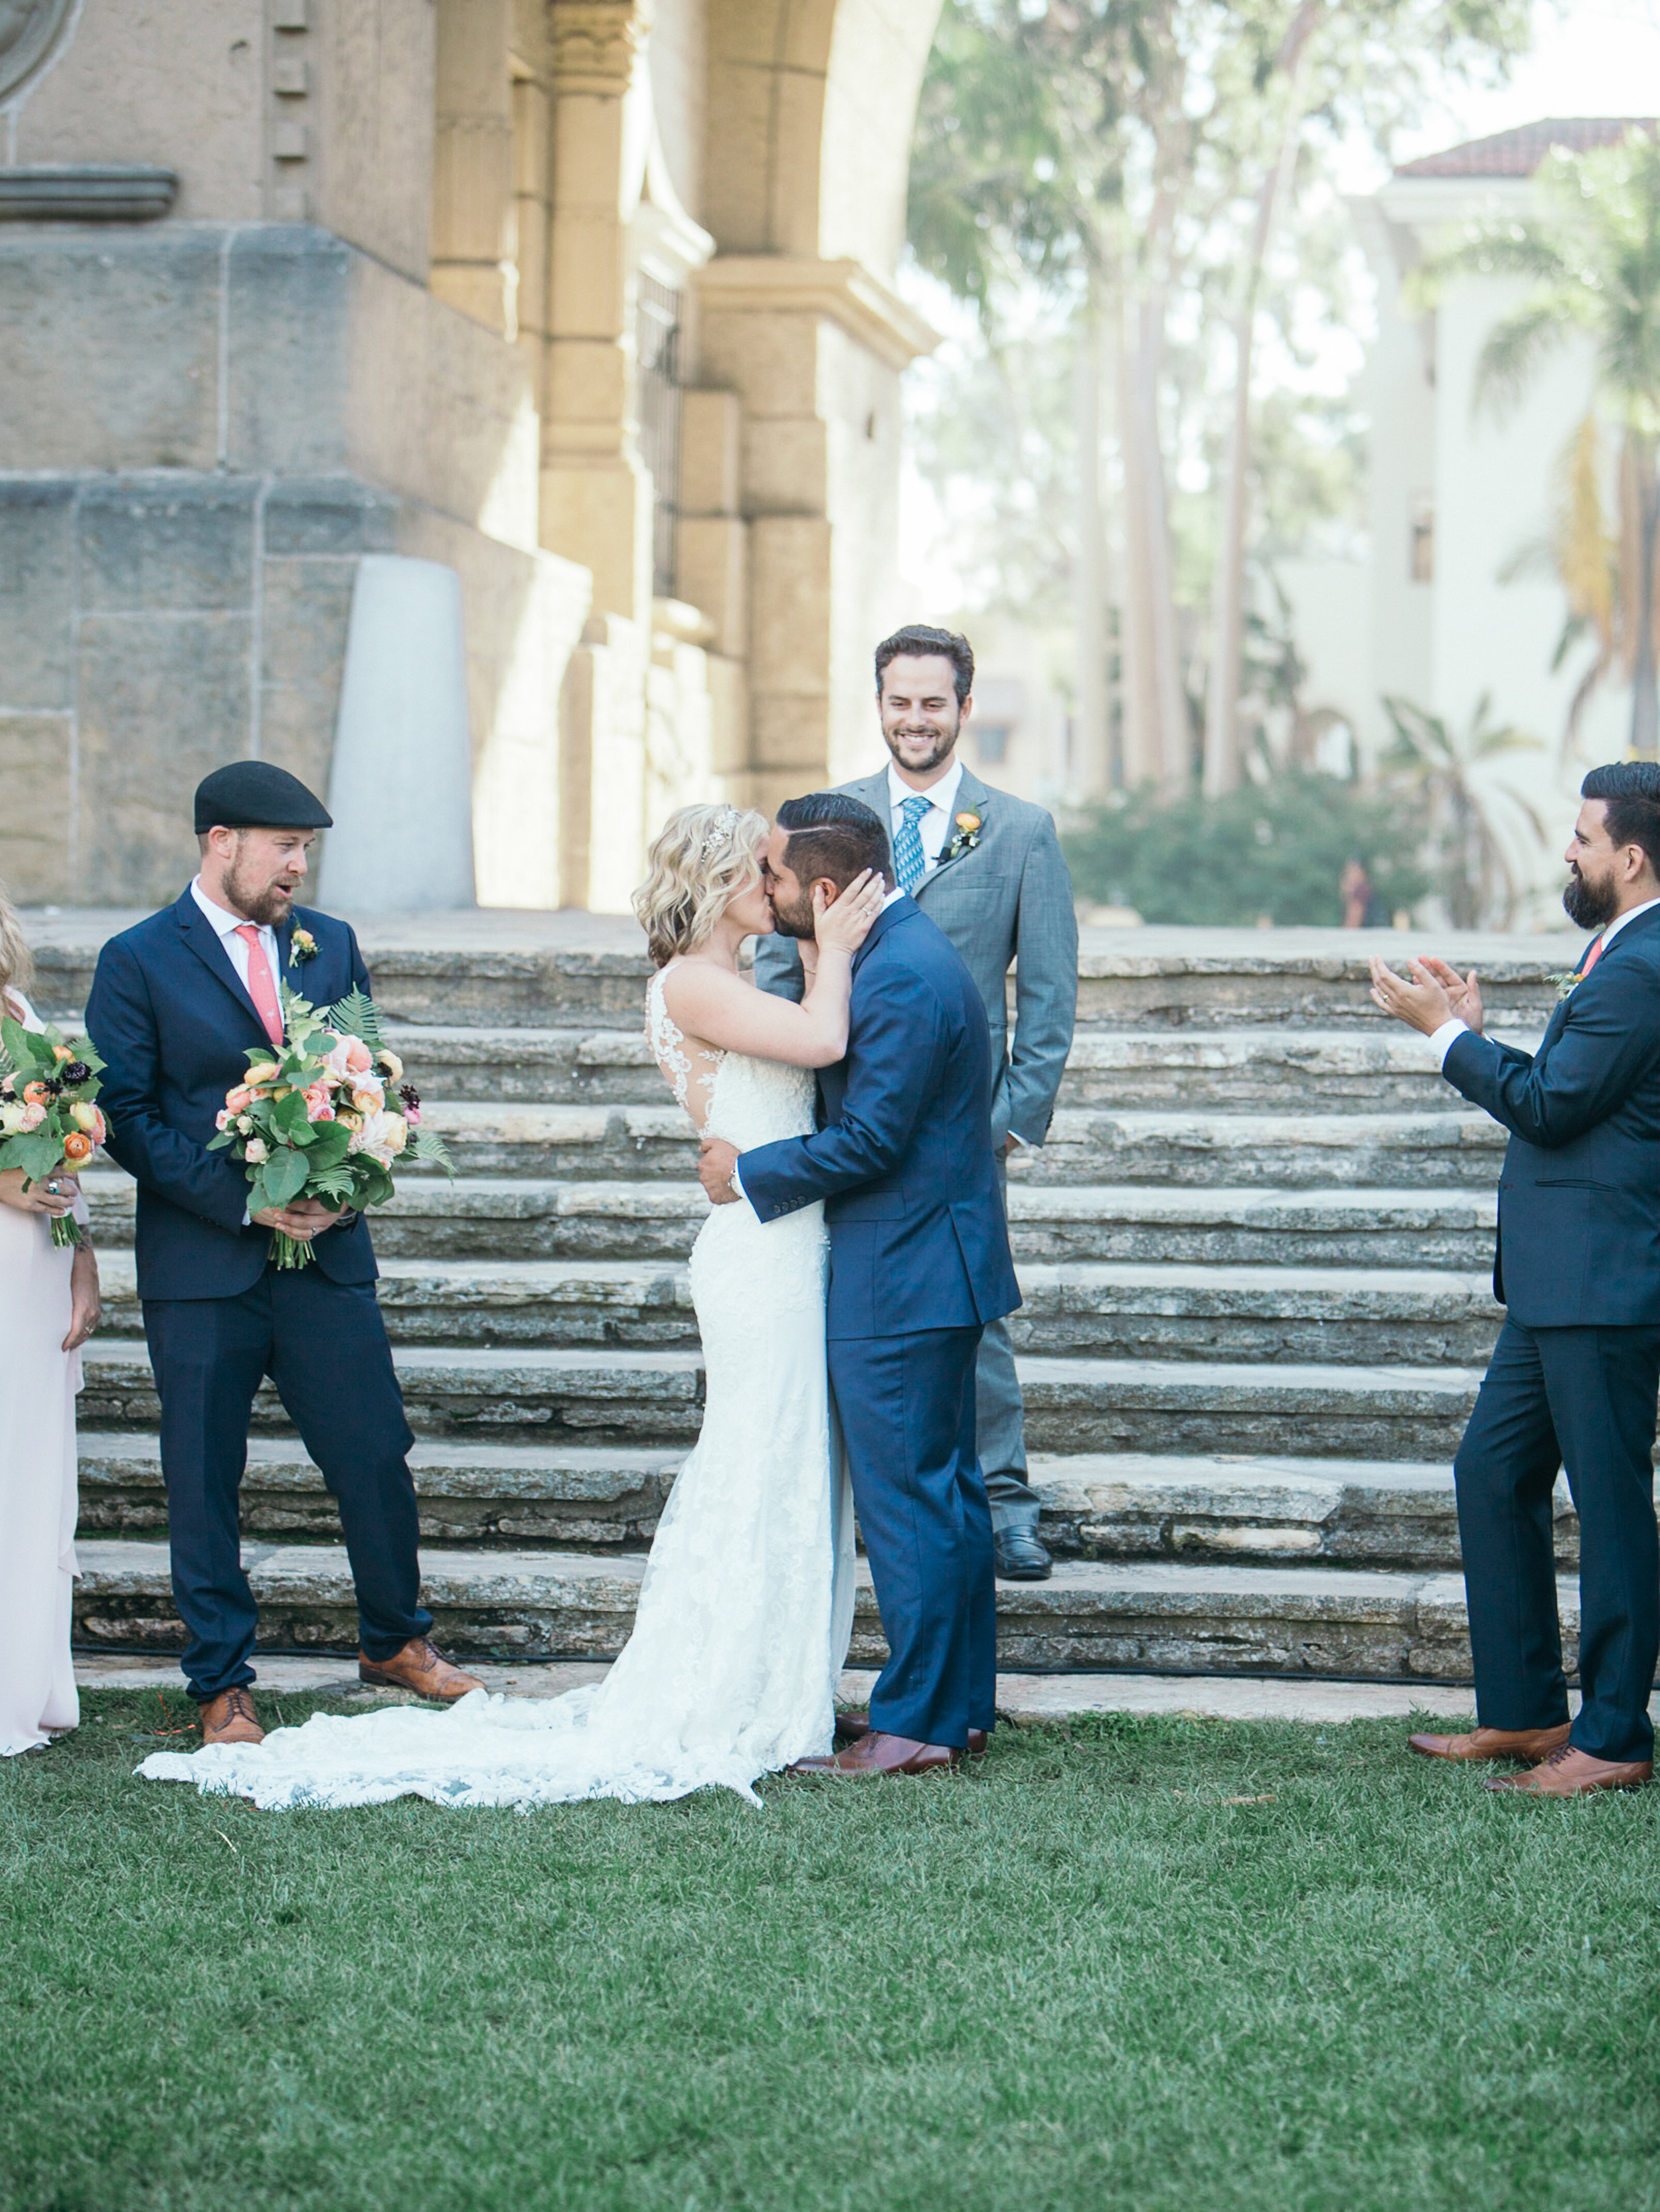 www.santabarbarawedding.com | Kiel Rucker | Riviera Mansion | Bride and Groom Kiss